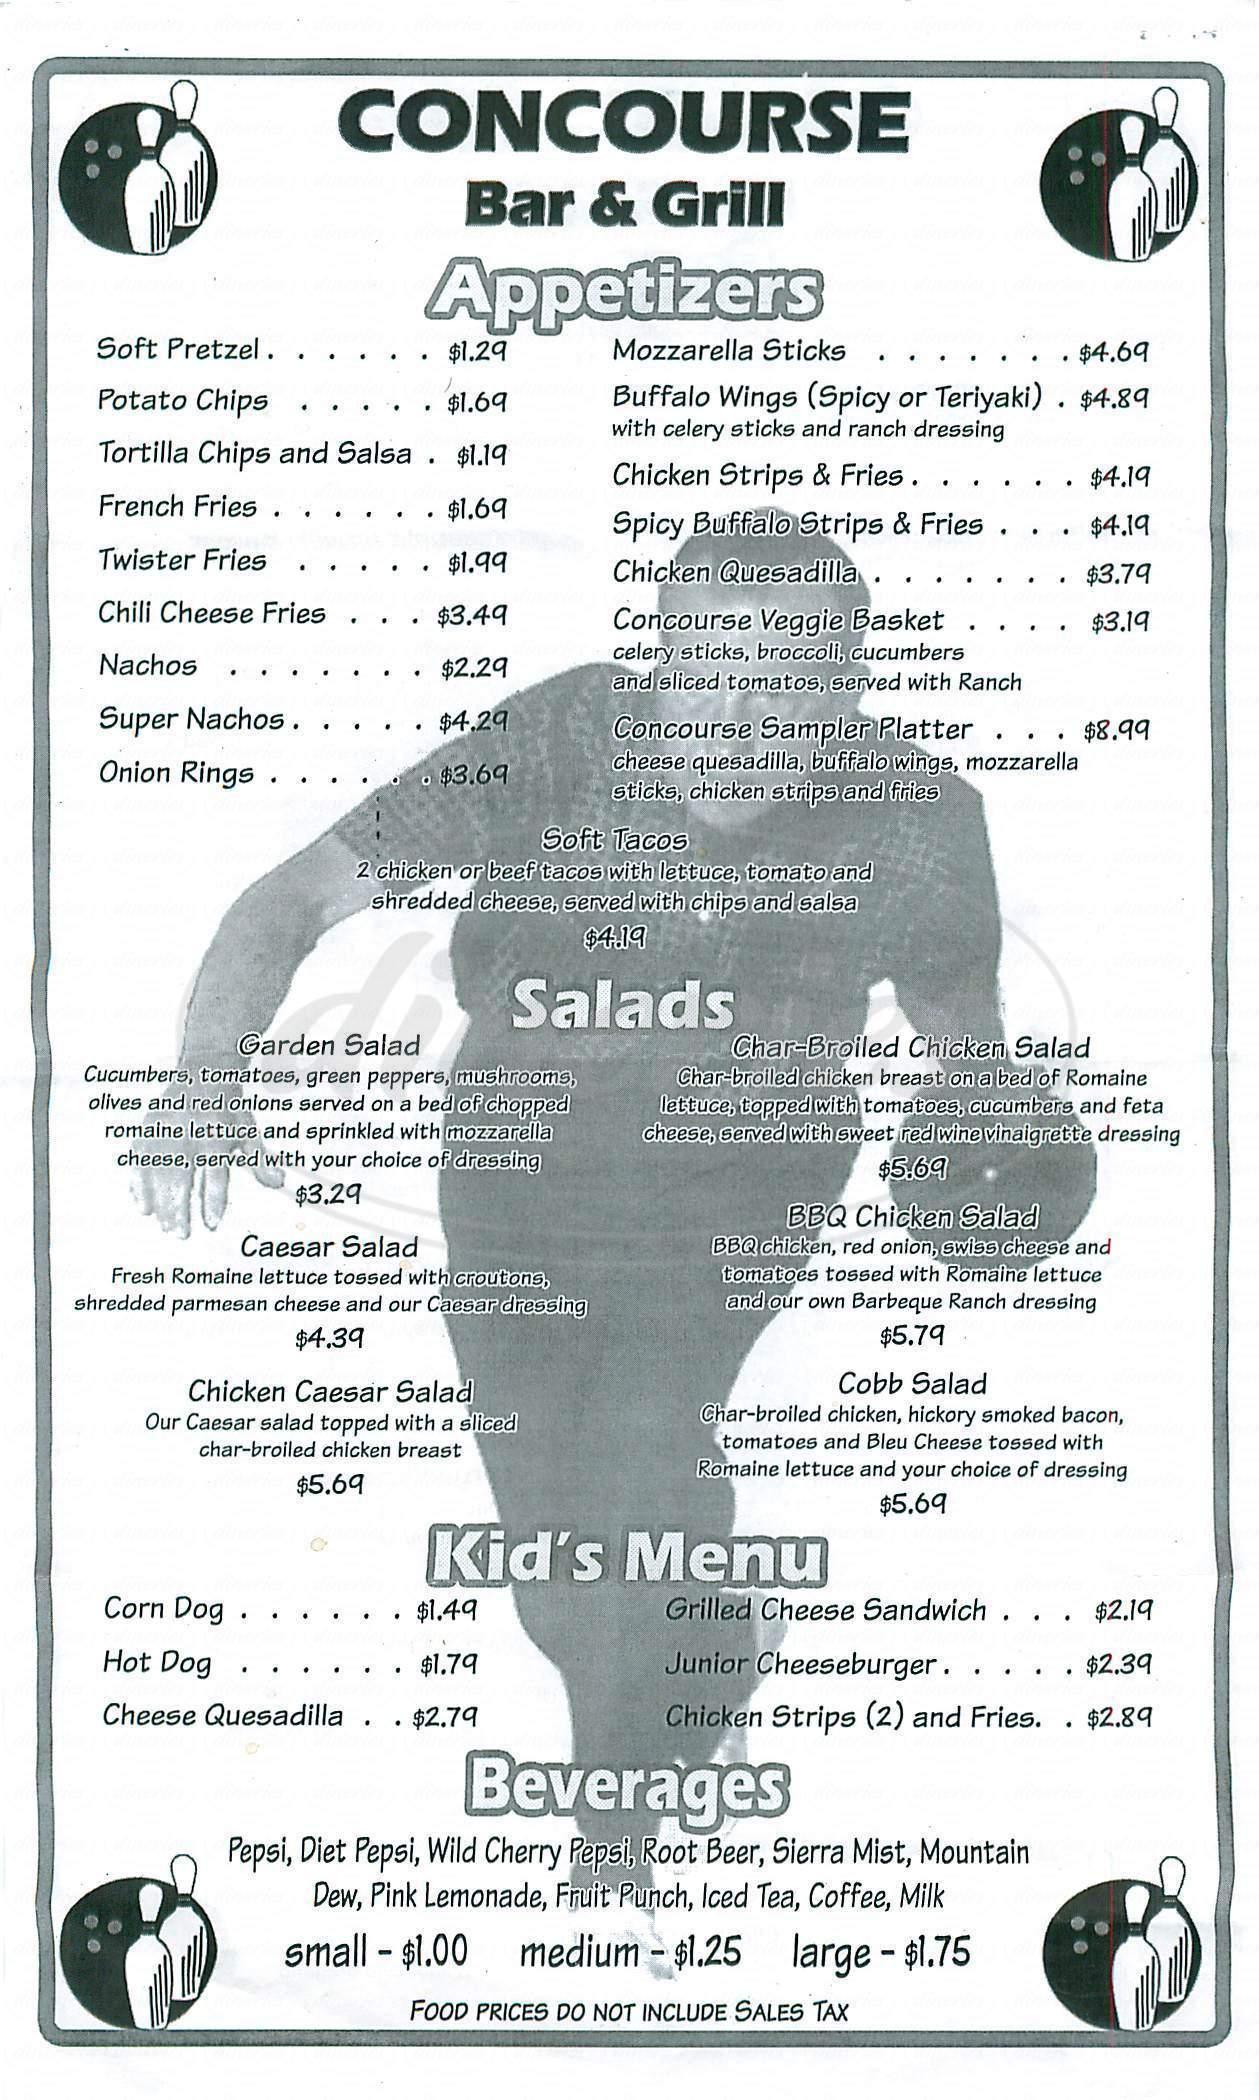 menu for Concourse Bar & Grill